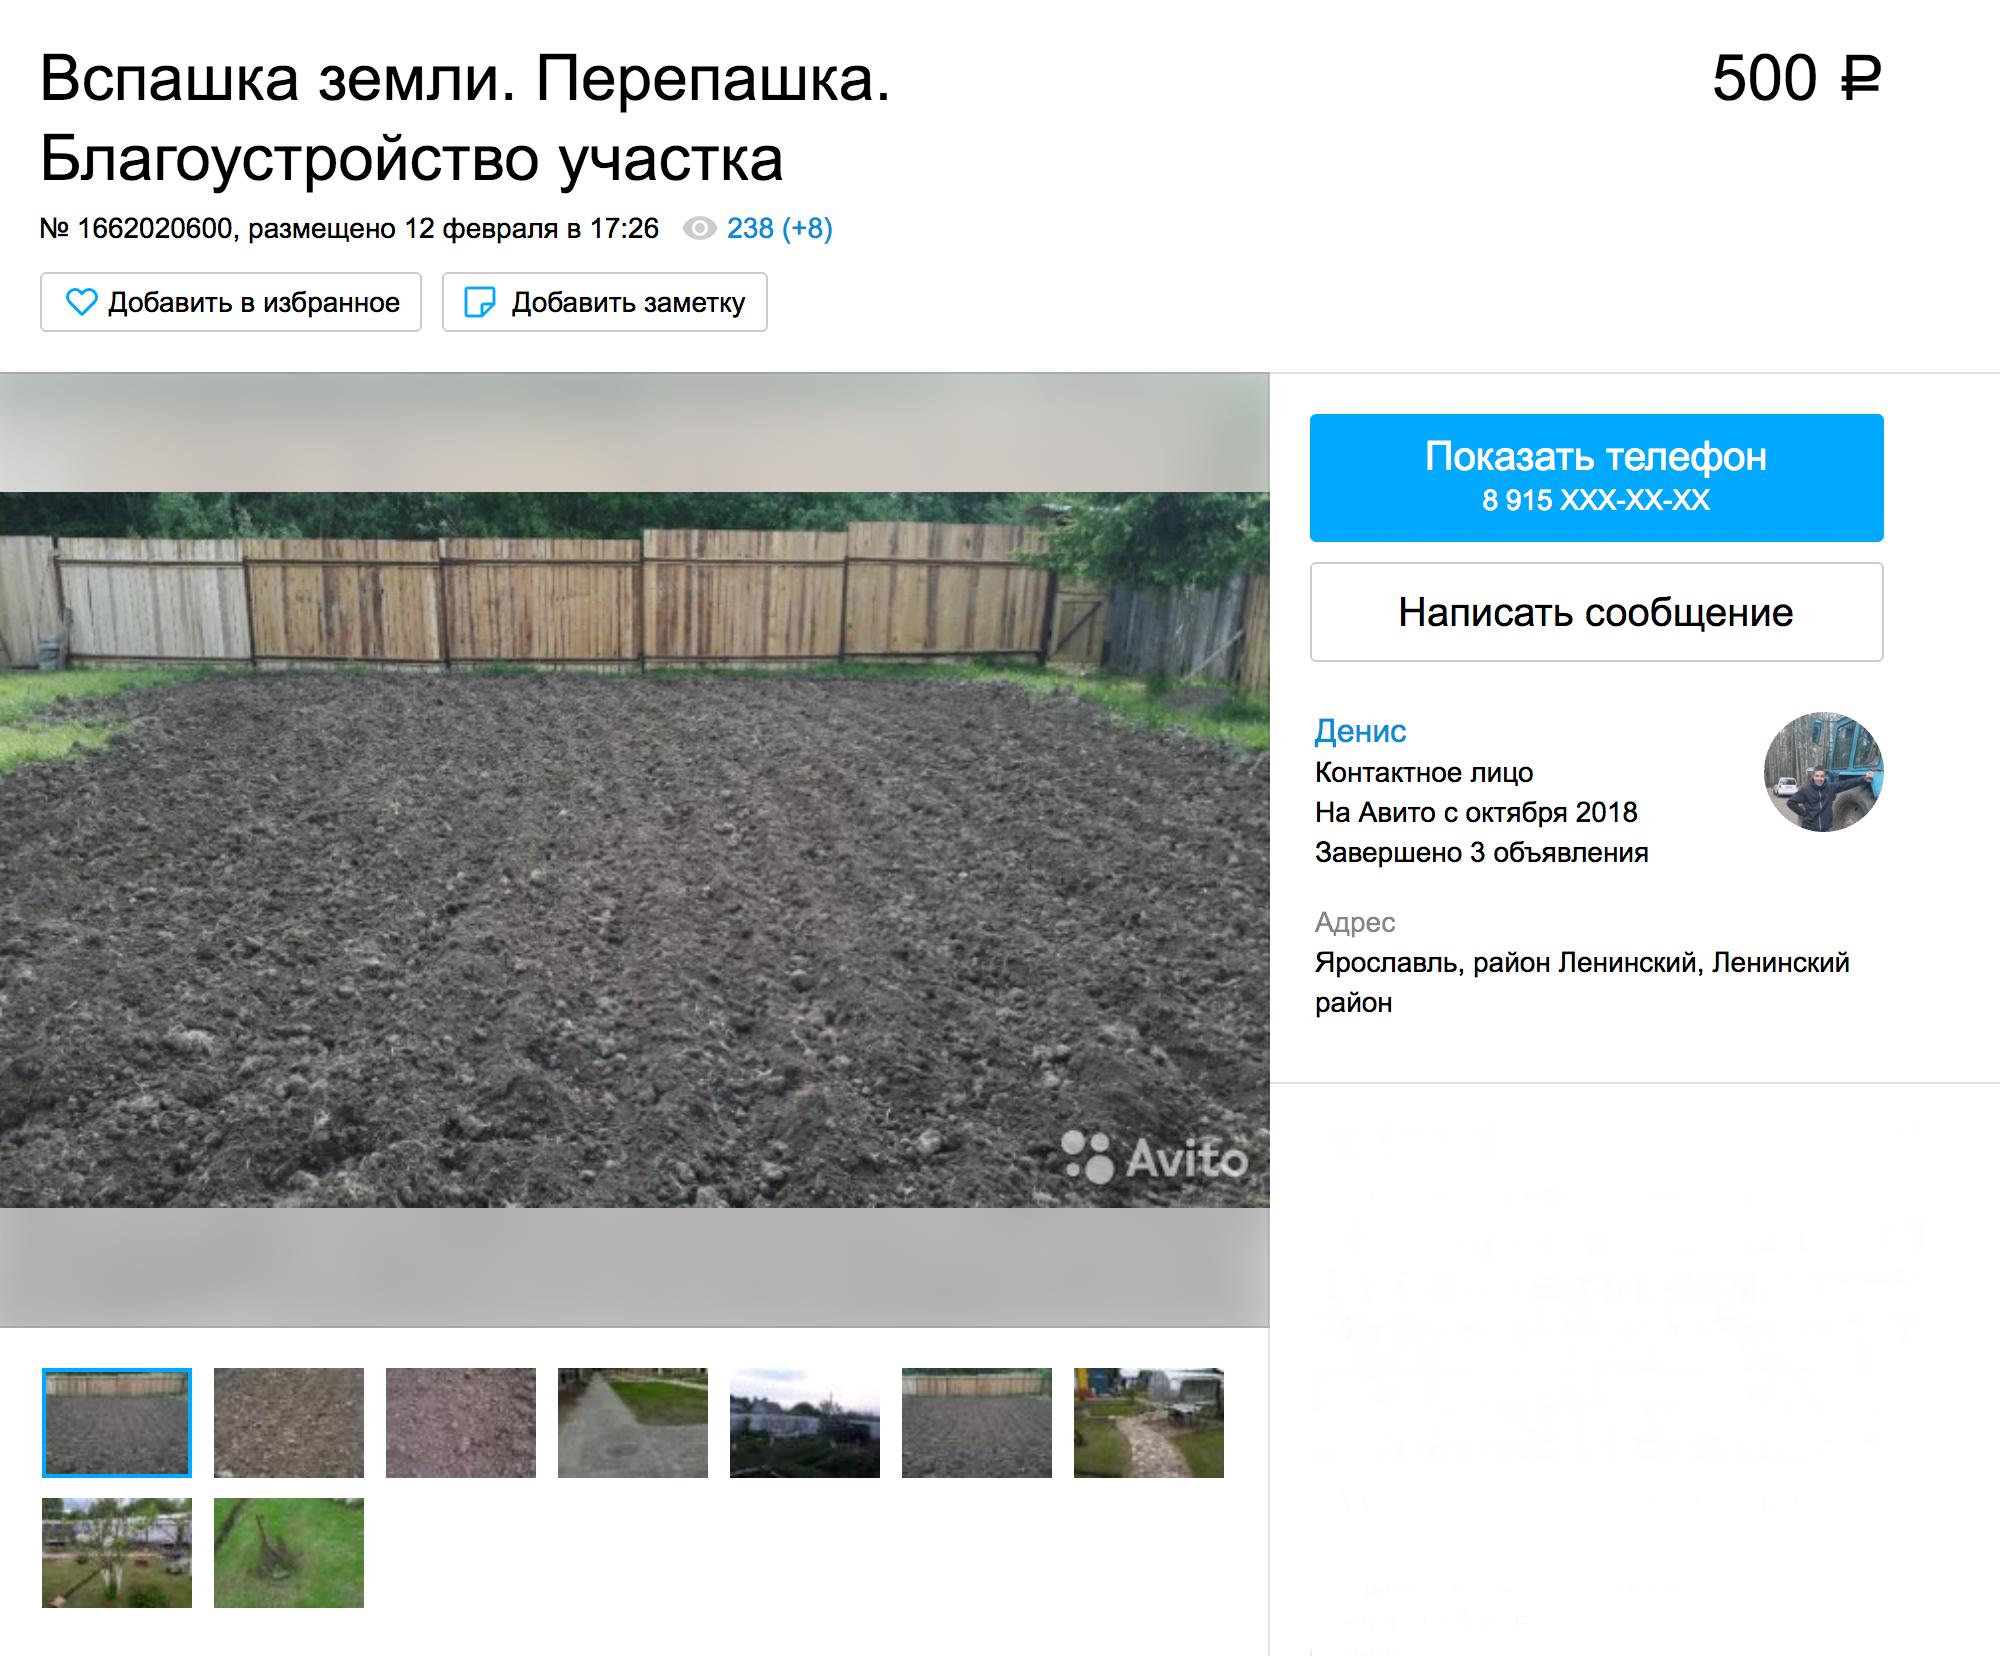 Вспашка участка мотоблоком стоит на «Авито» от 500<span class=ruble>Р</span> за сотку